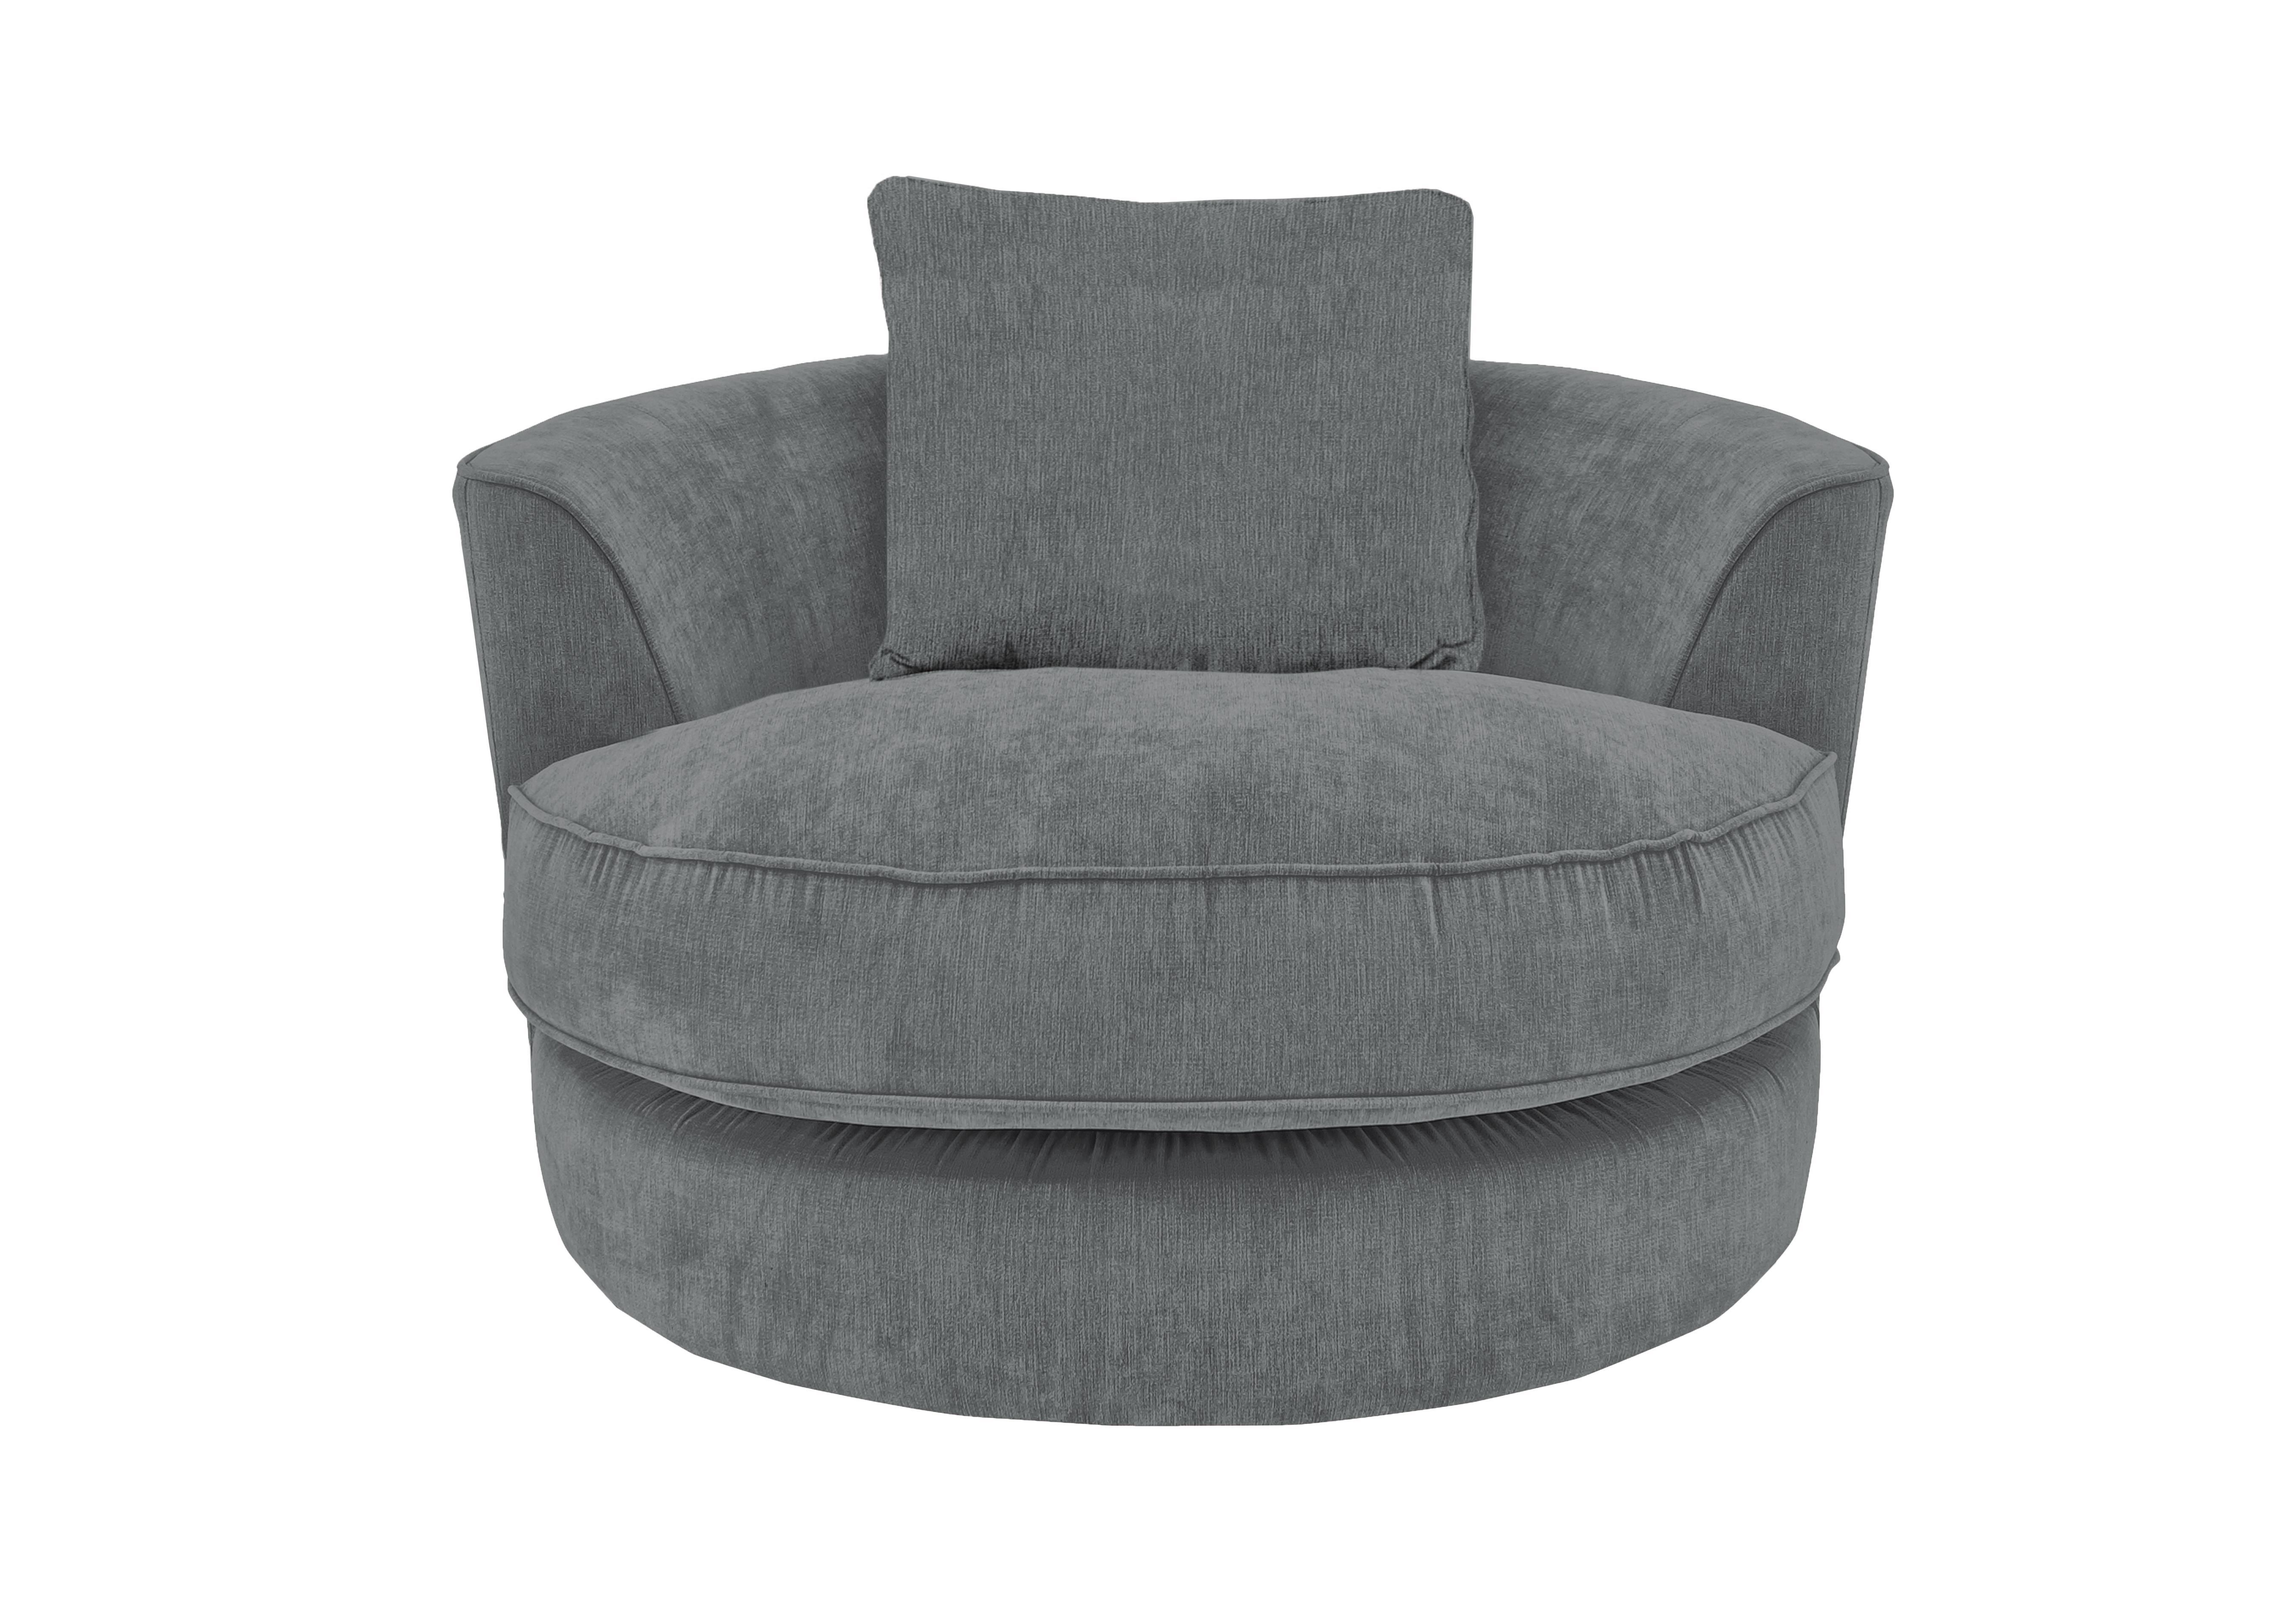 Attrayant Save £100. Boardwalk Fabric Swivel Armchair